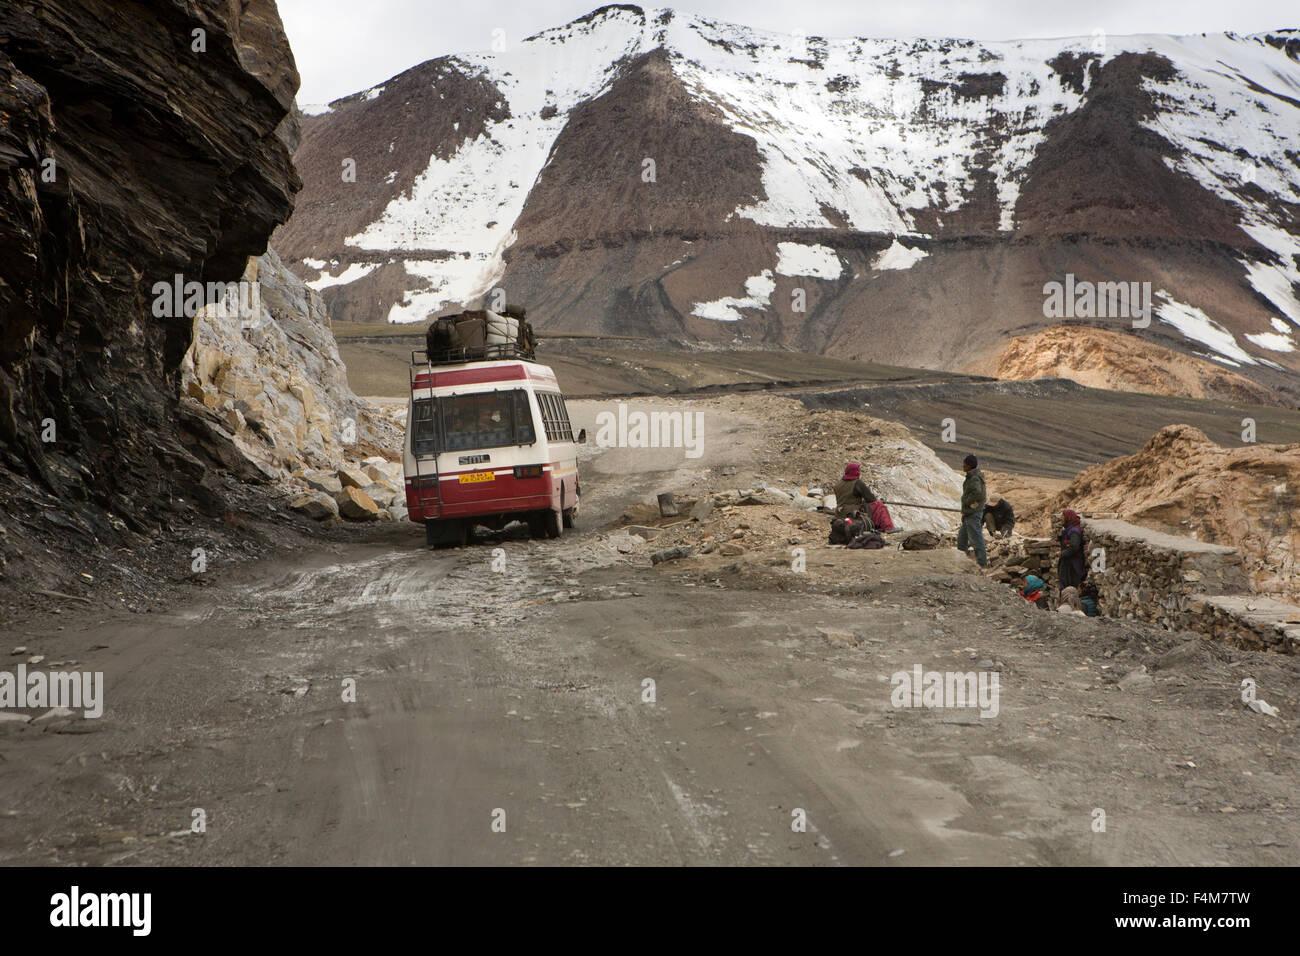 India, Jammu & Kashmir, Ladakh, Taglang La pass, bus to Manali on rough section through mountains - Stock Image